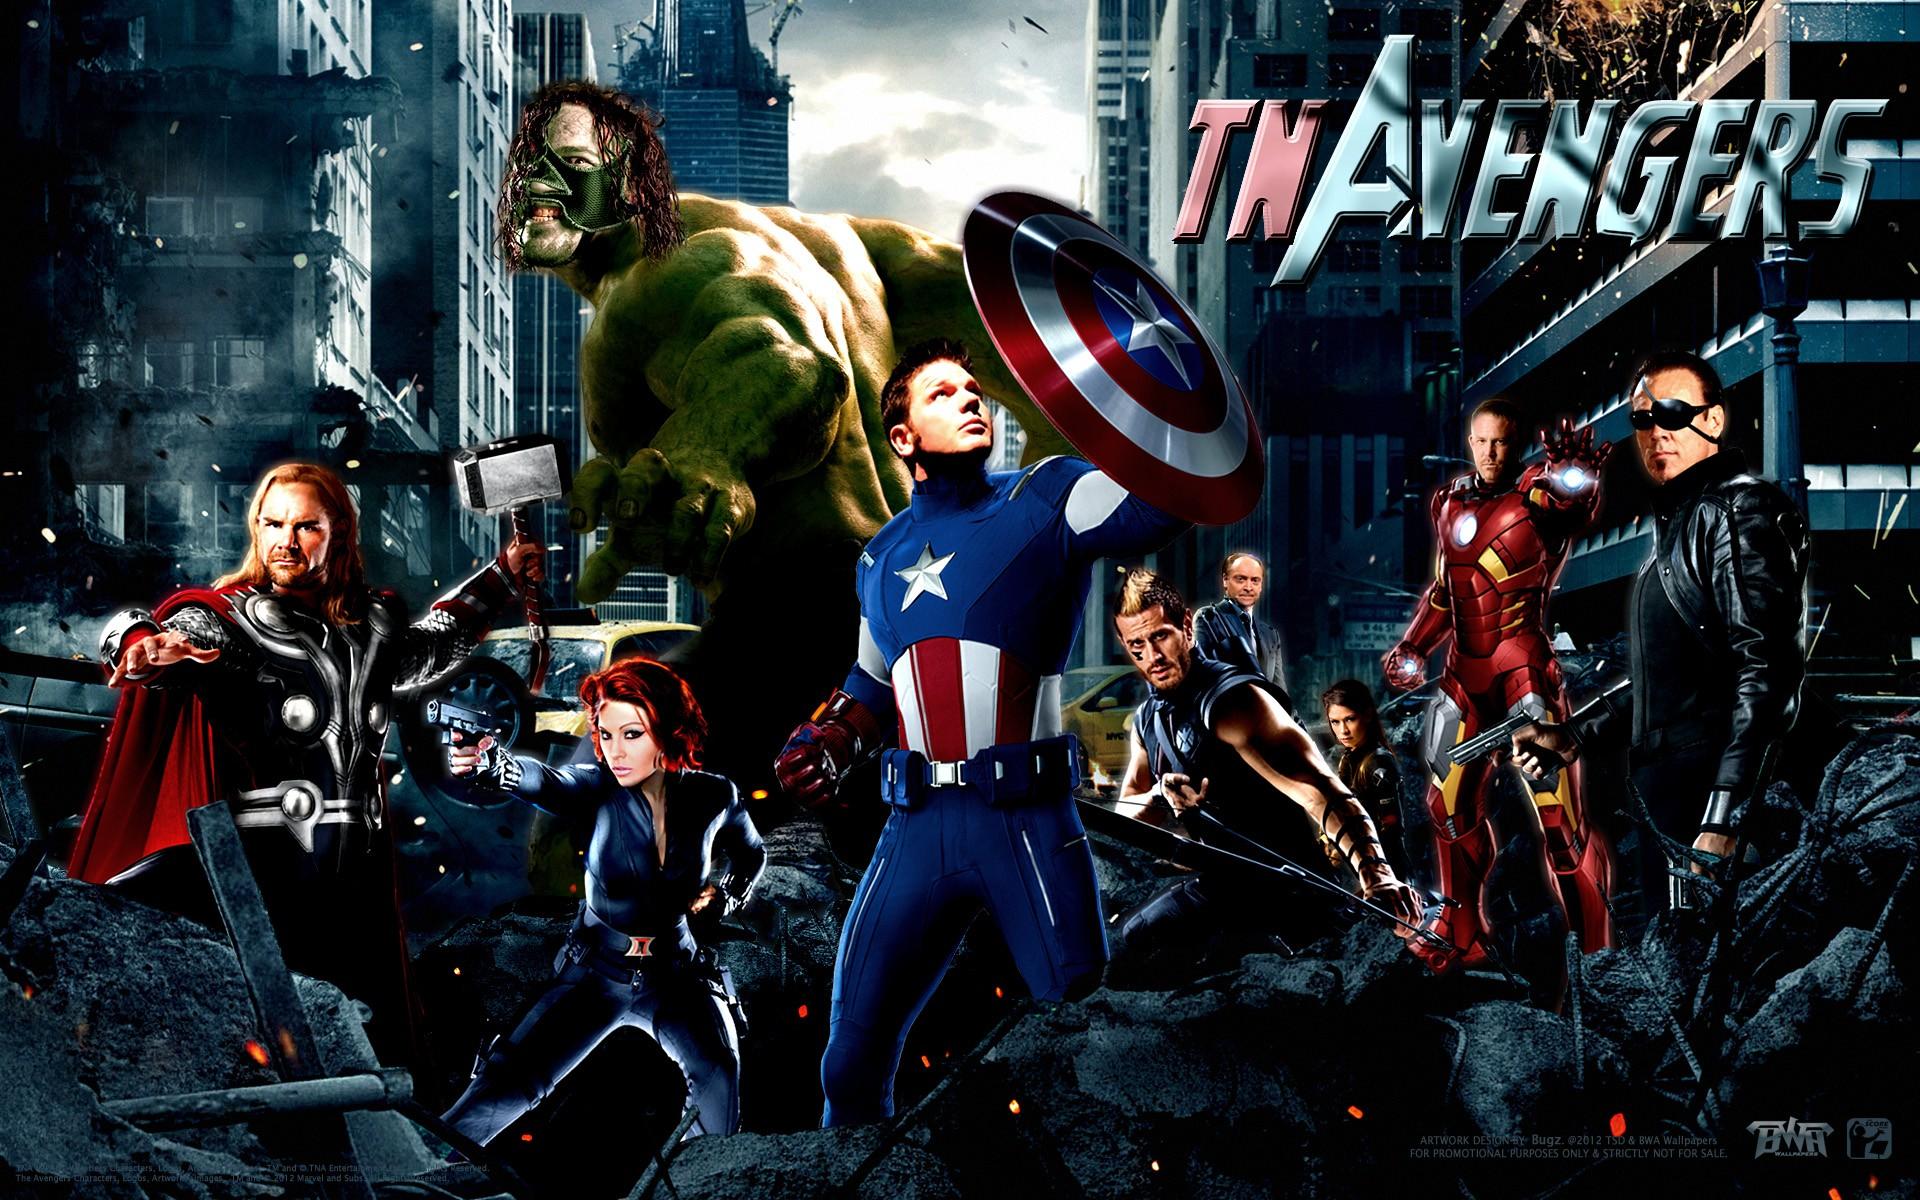 Avengers wallpaper ·① Download free amazing full HD ...